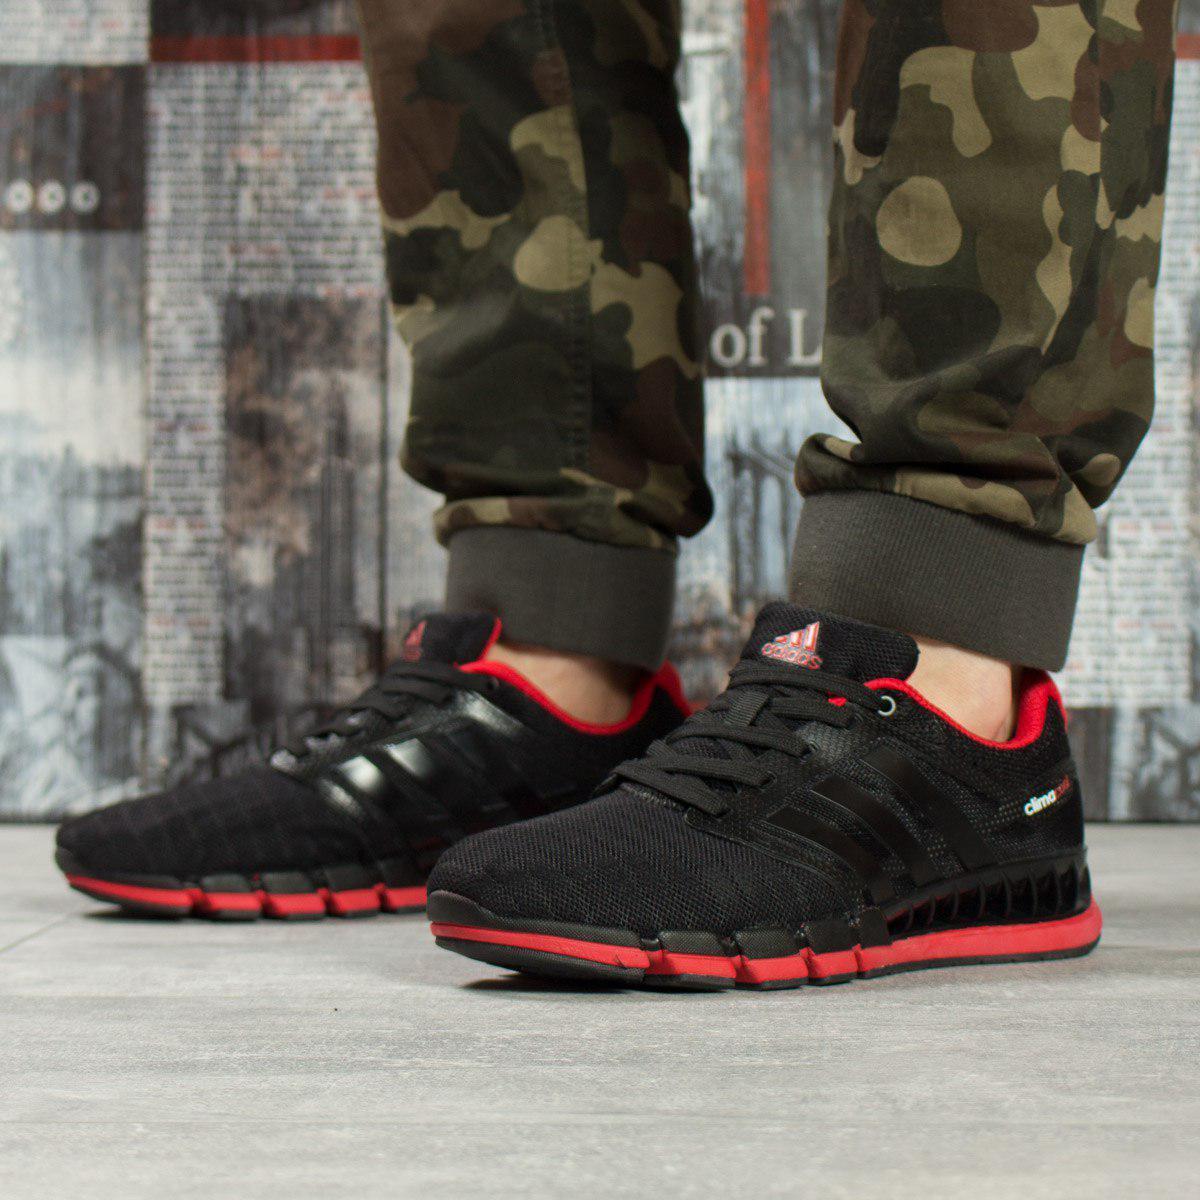 e4614a422ed864 Мужские кроссовки Adidas Climacool | Адидас | Чоловічі кросівки Адідас  (черные )